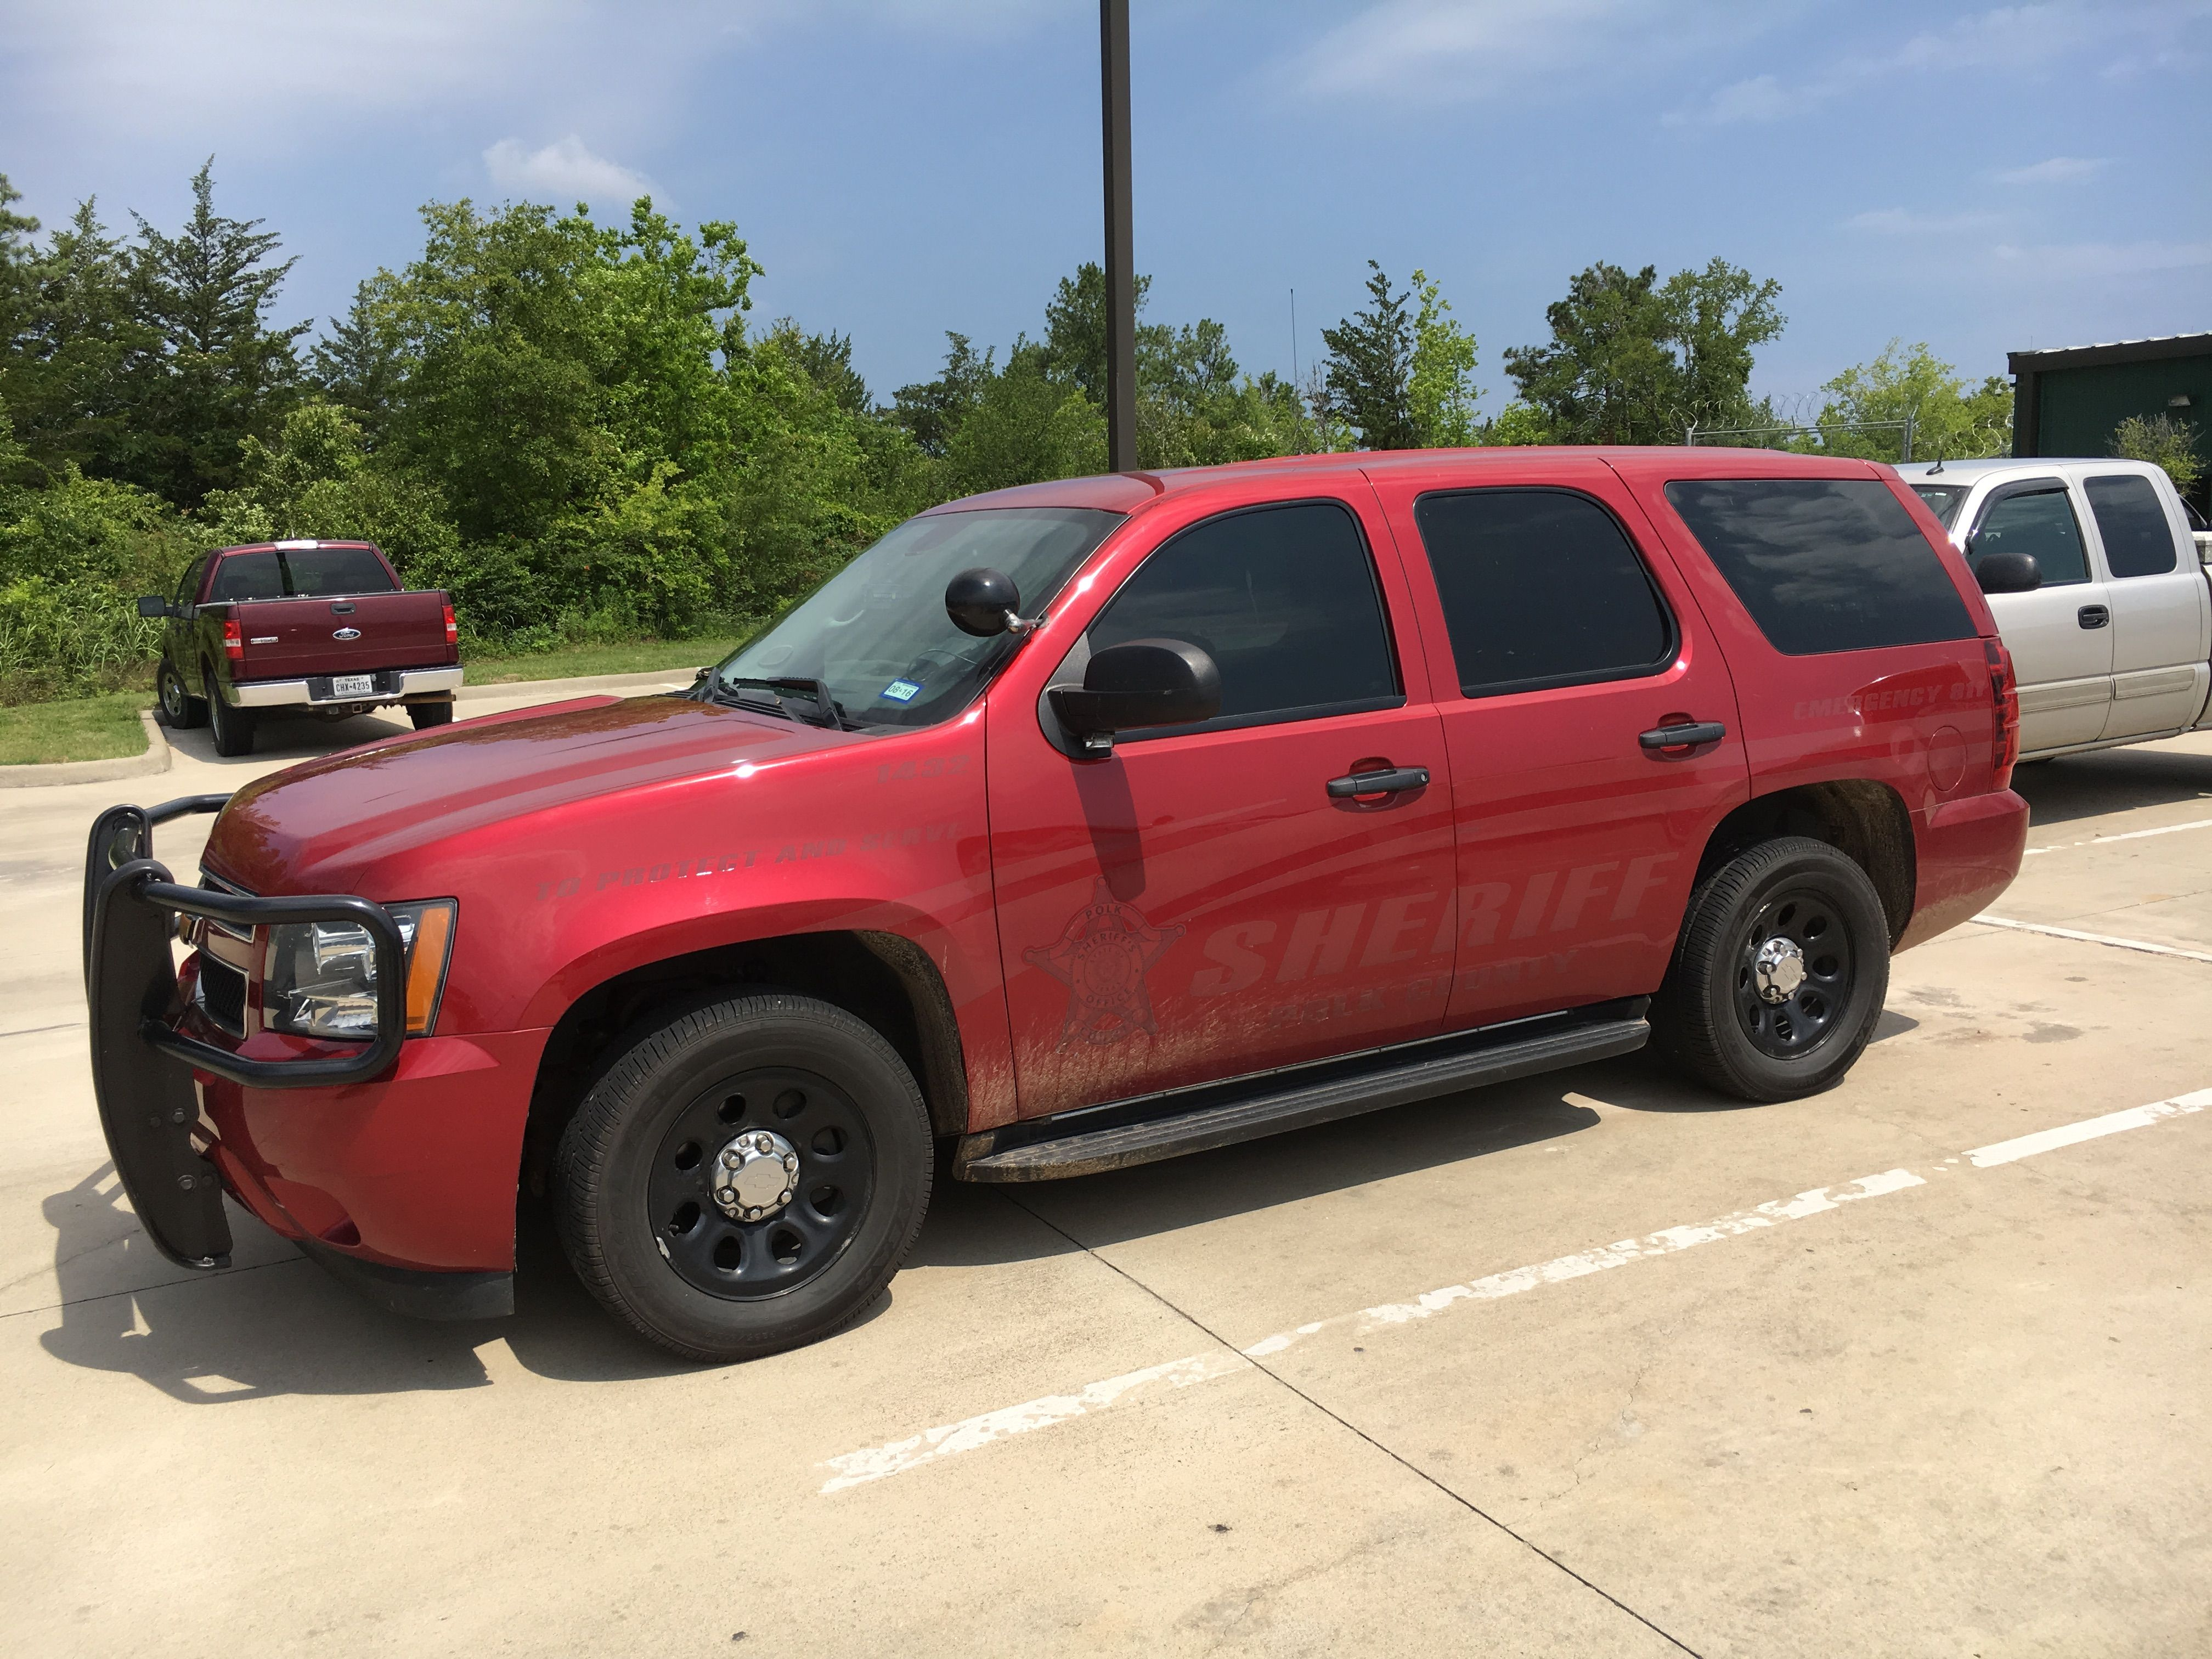 Texas Motor Vehicle Laws - impremedia.net